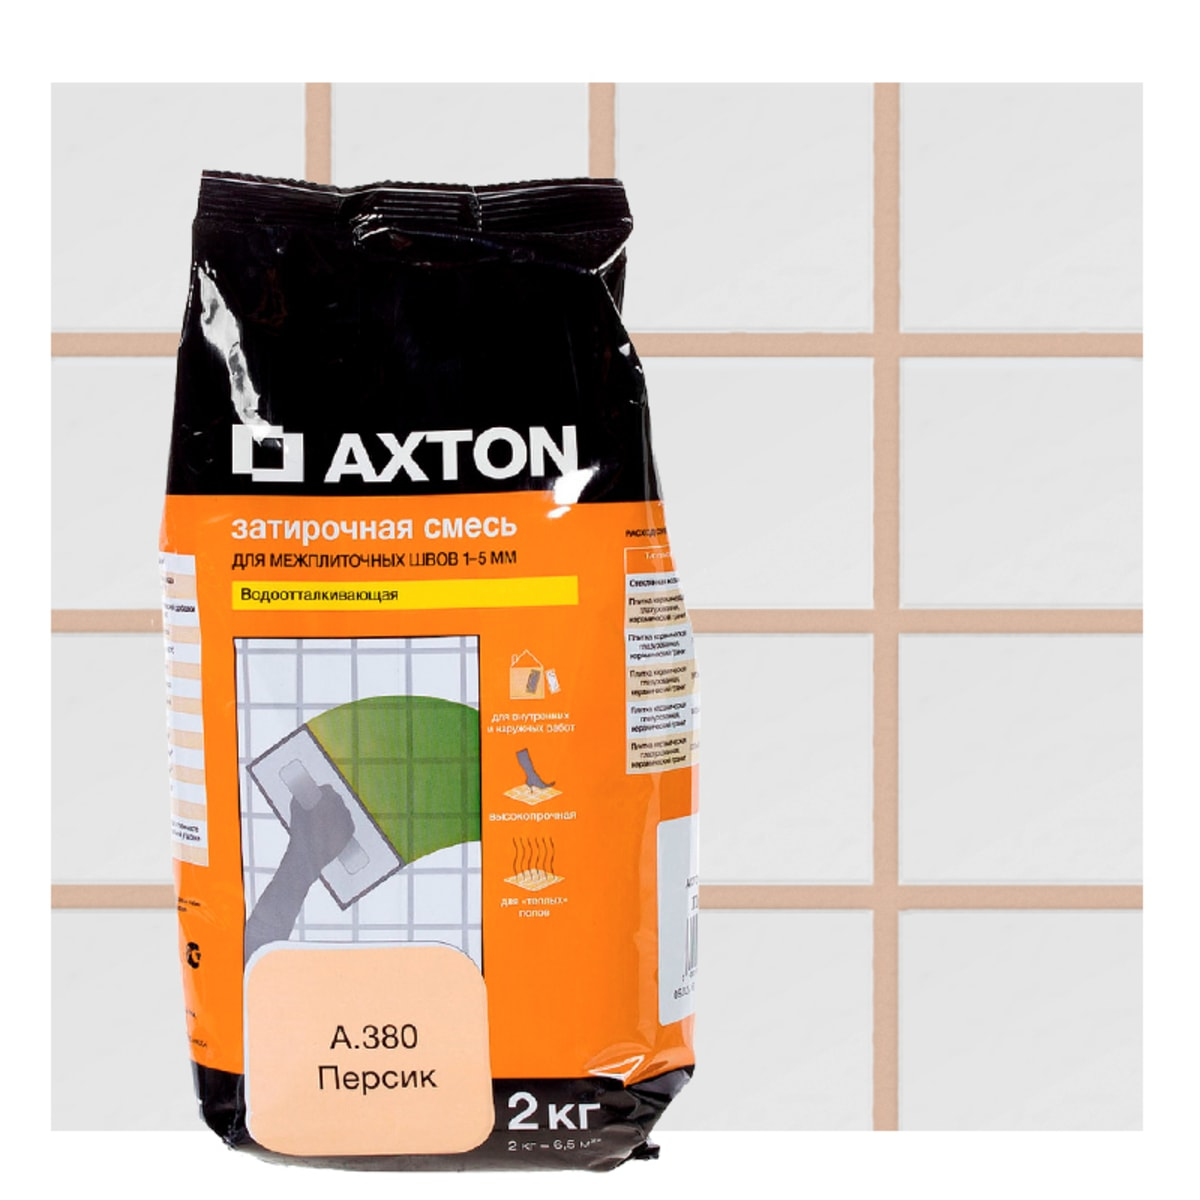 Затирка цементная Axton А.380 2 кг цвет персик